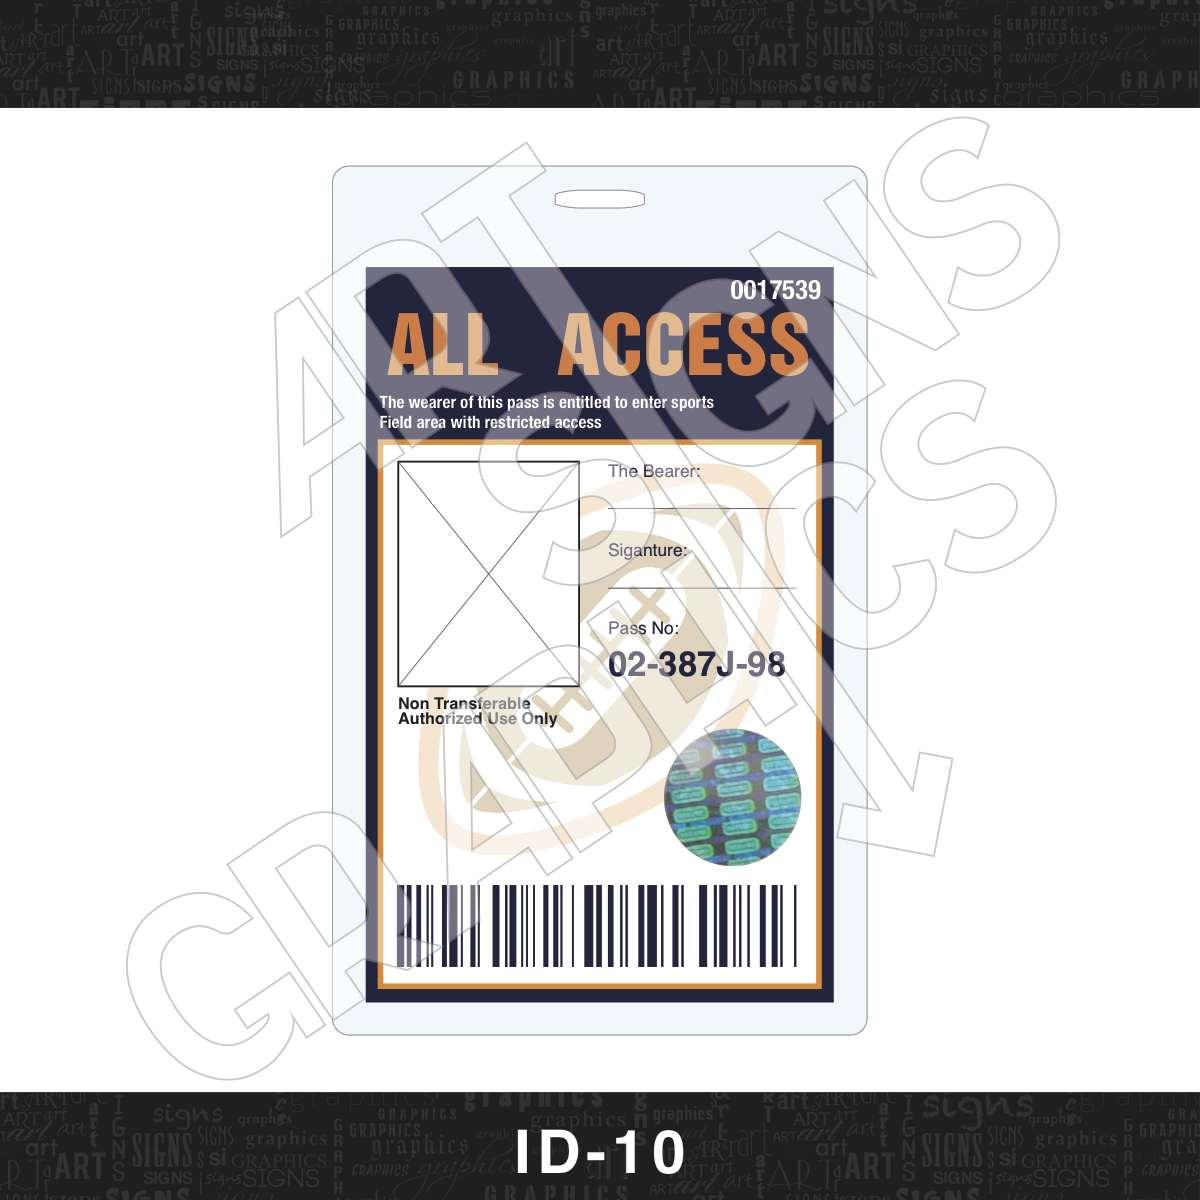 ID-10.jpg